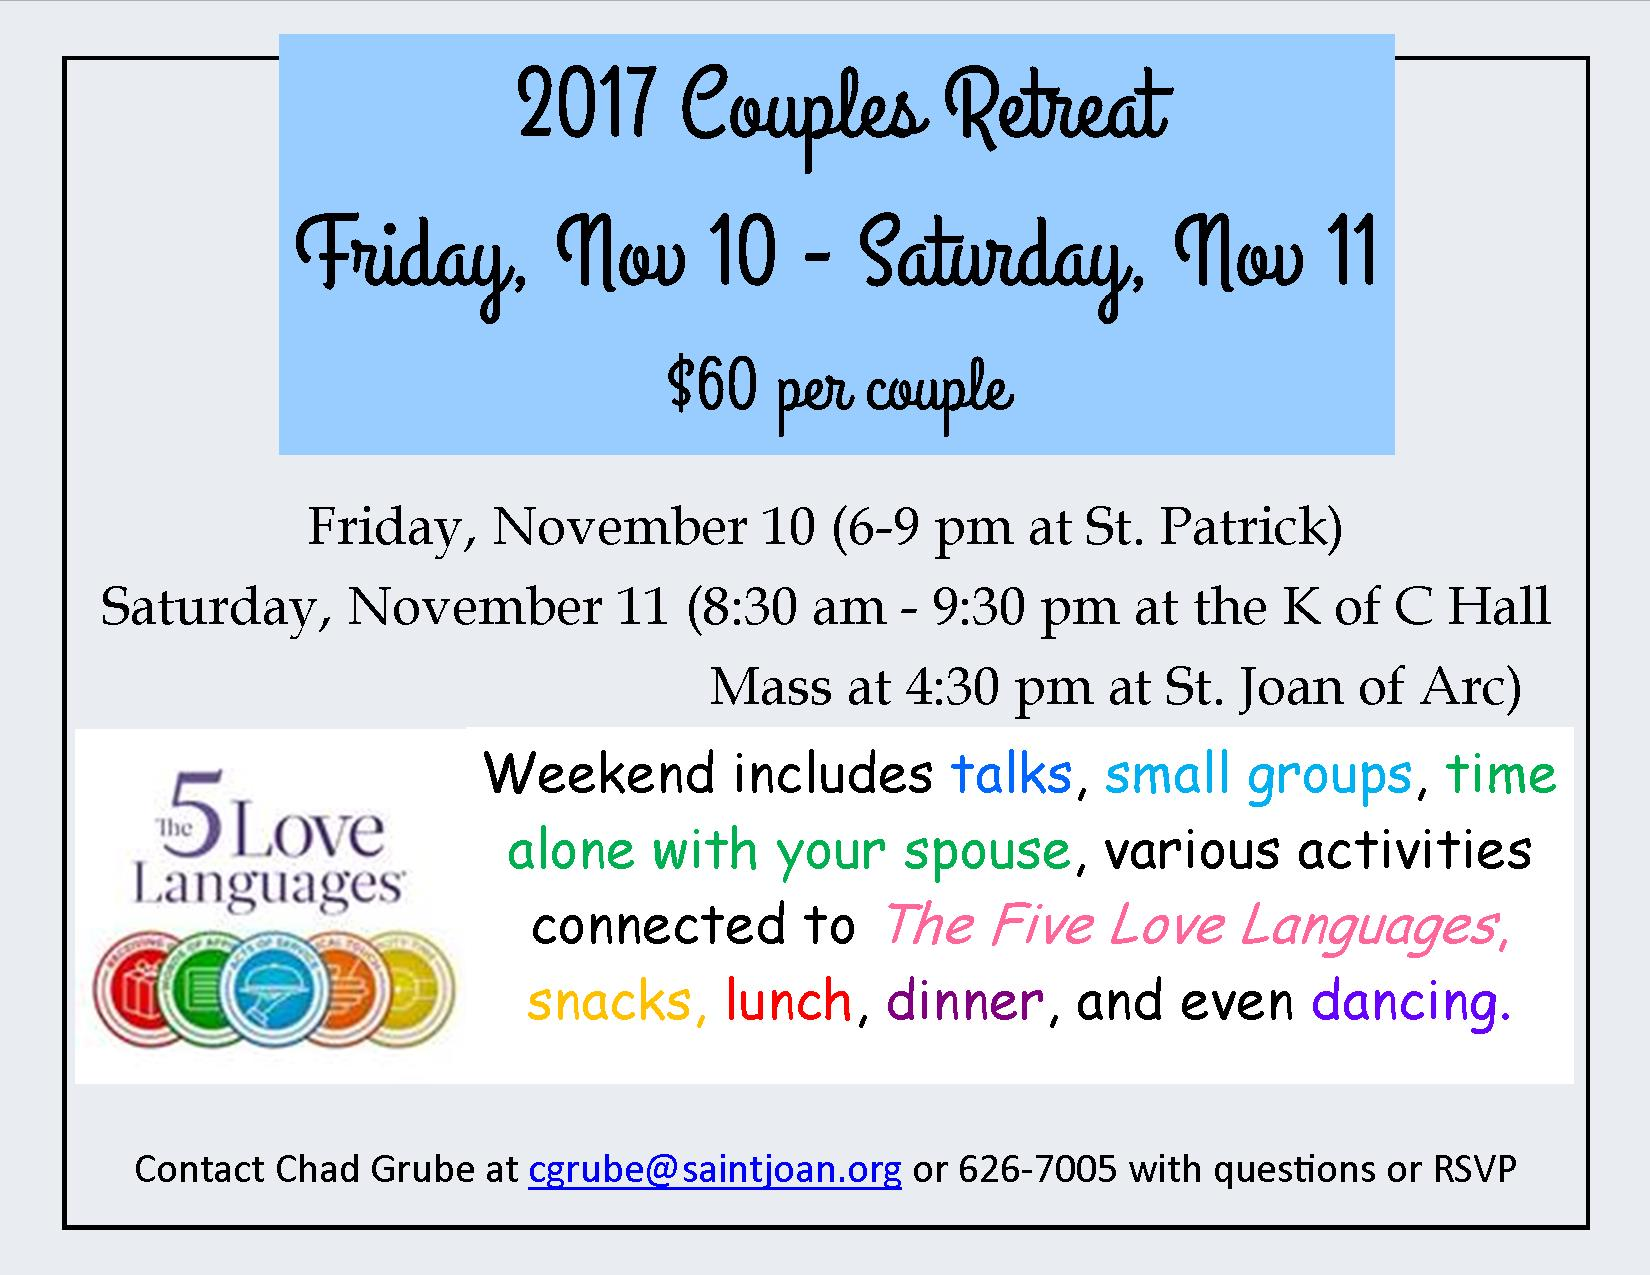 couples retreat 2017.jpg